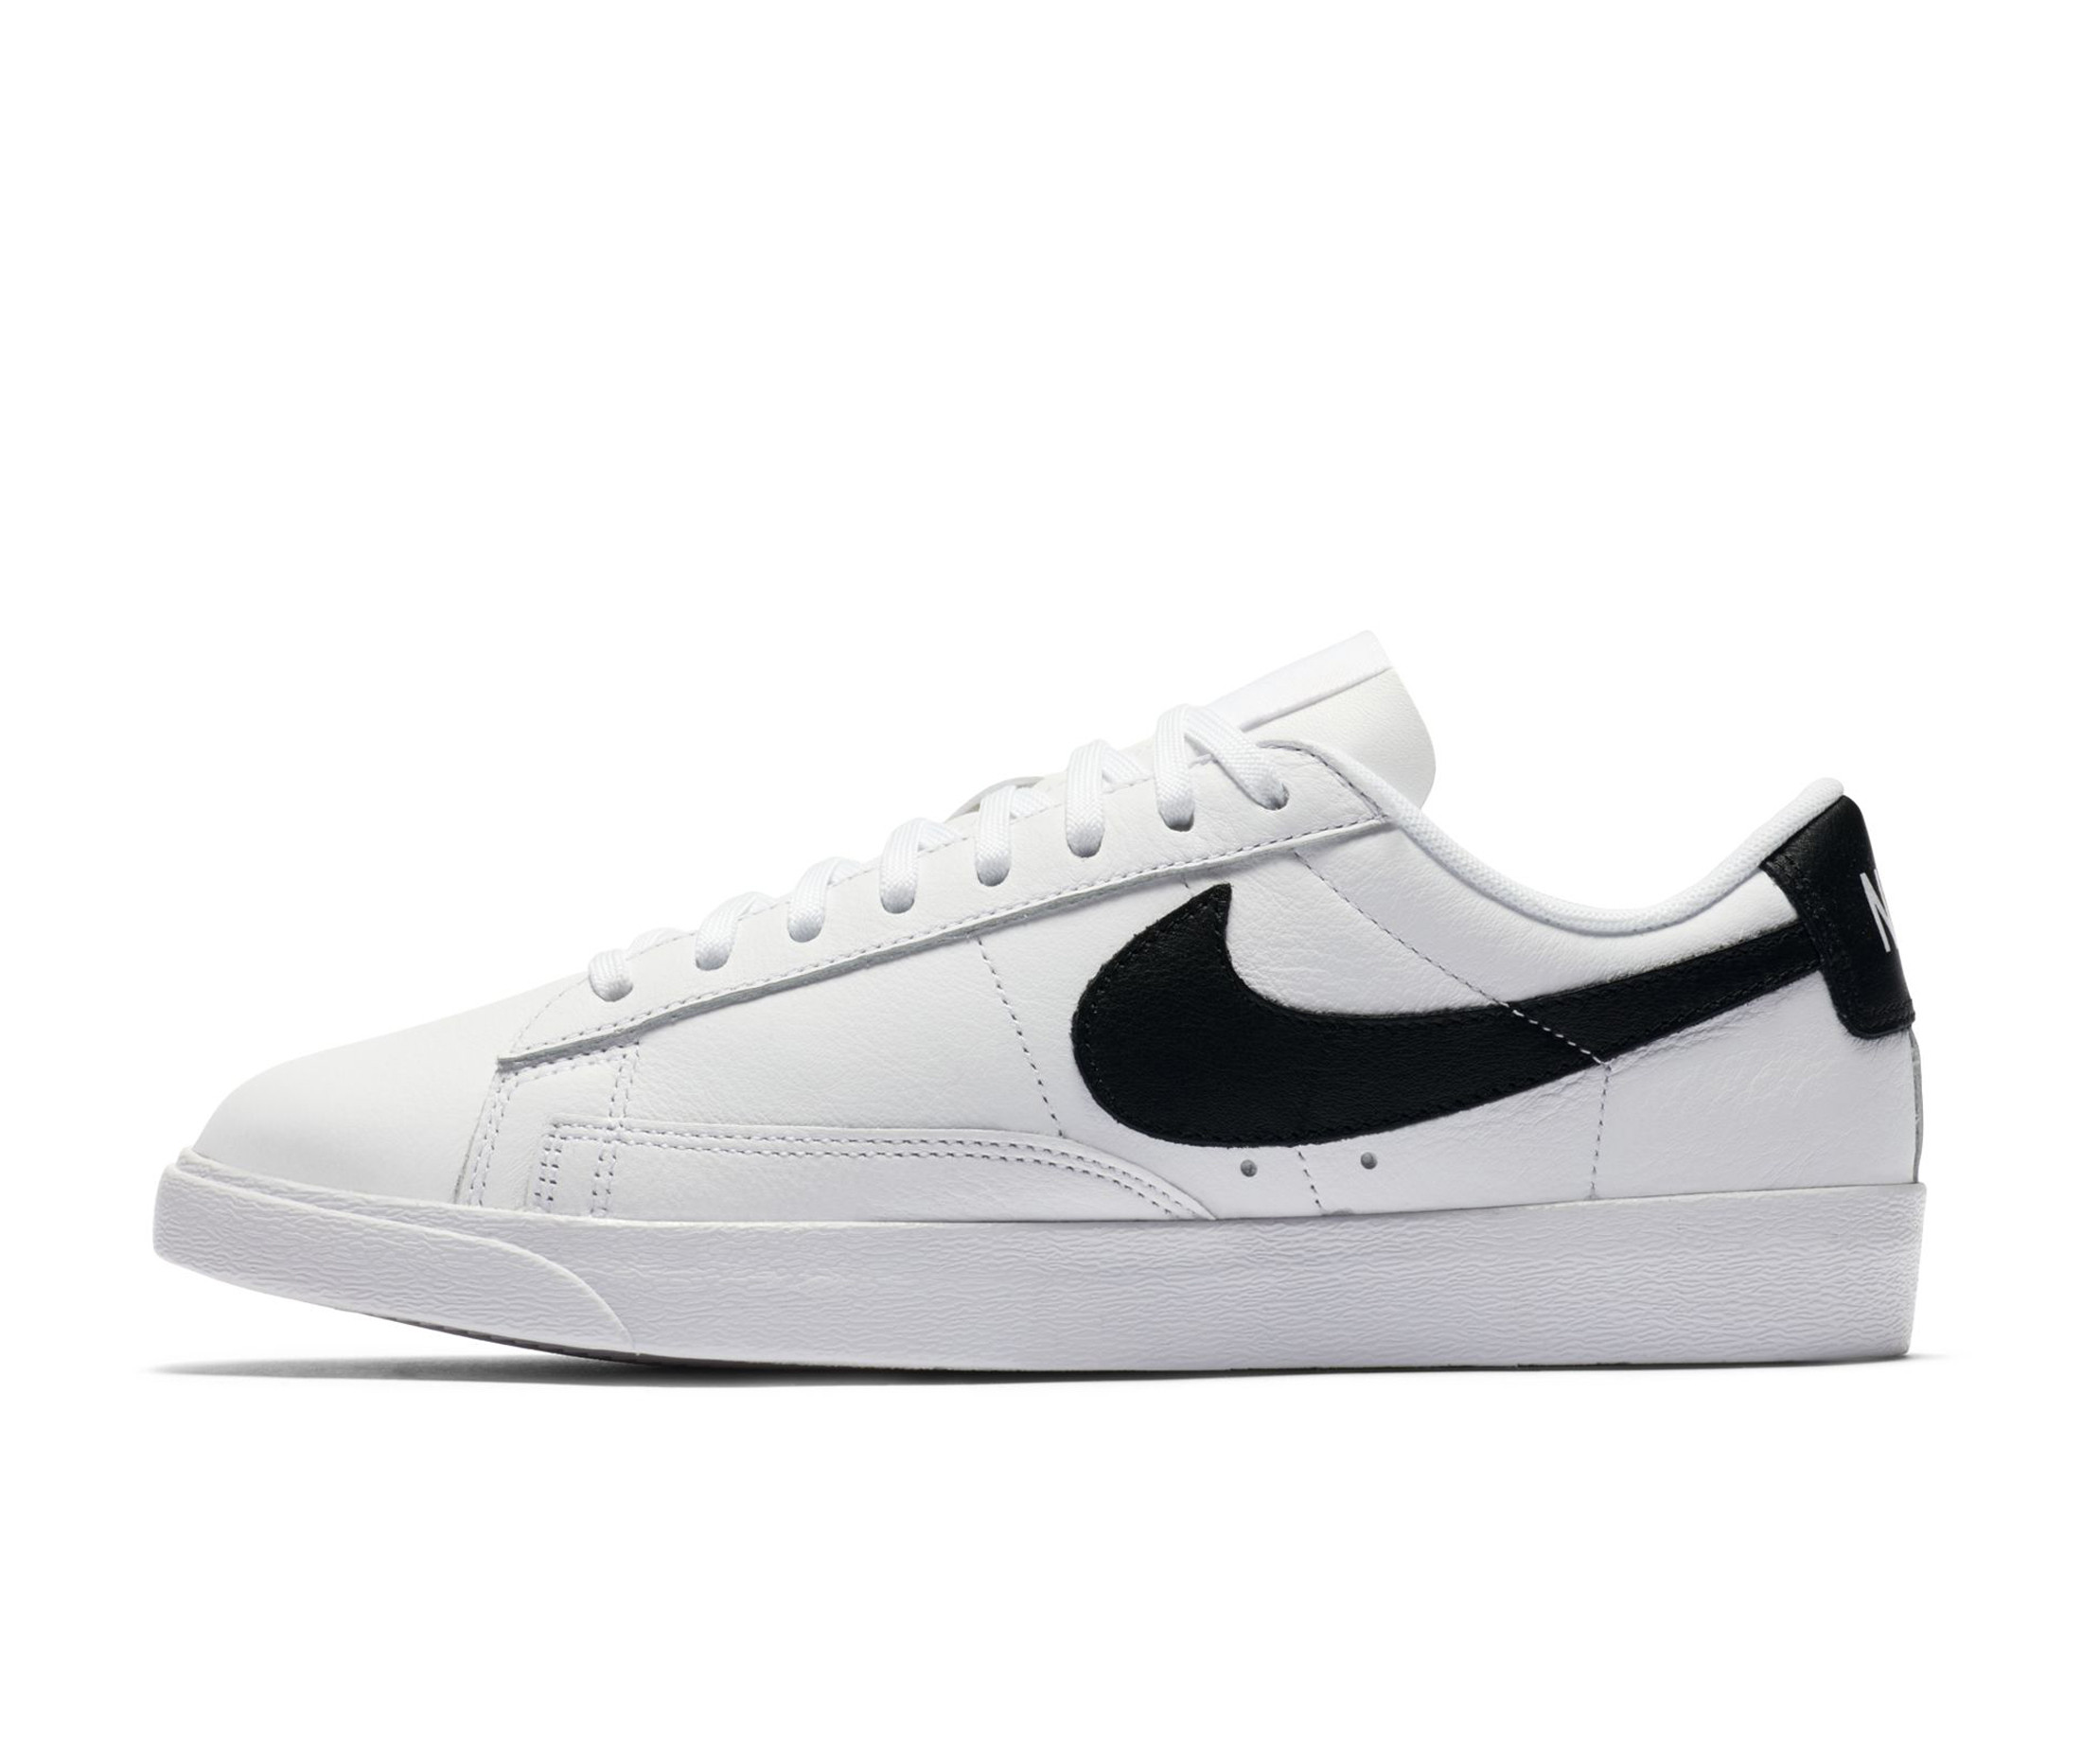 Femme Blanc Chaussure Noir Et Nike 7yvgbYf6